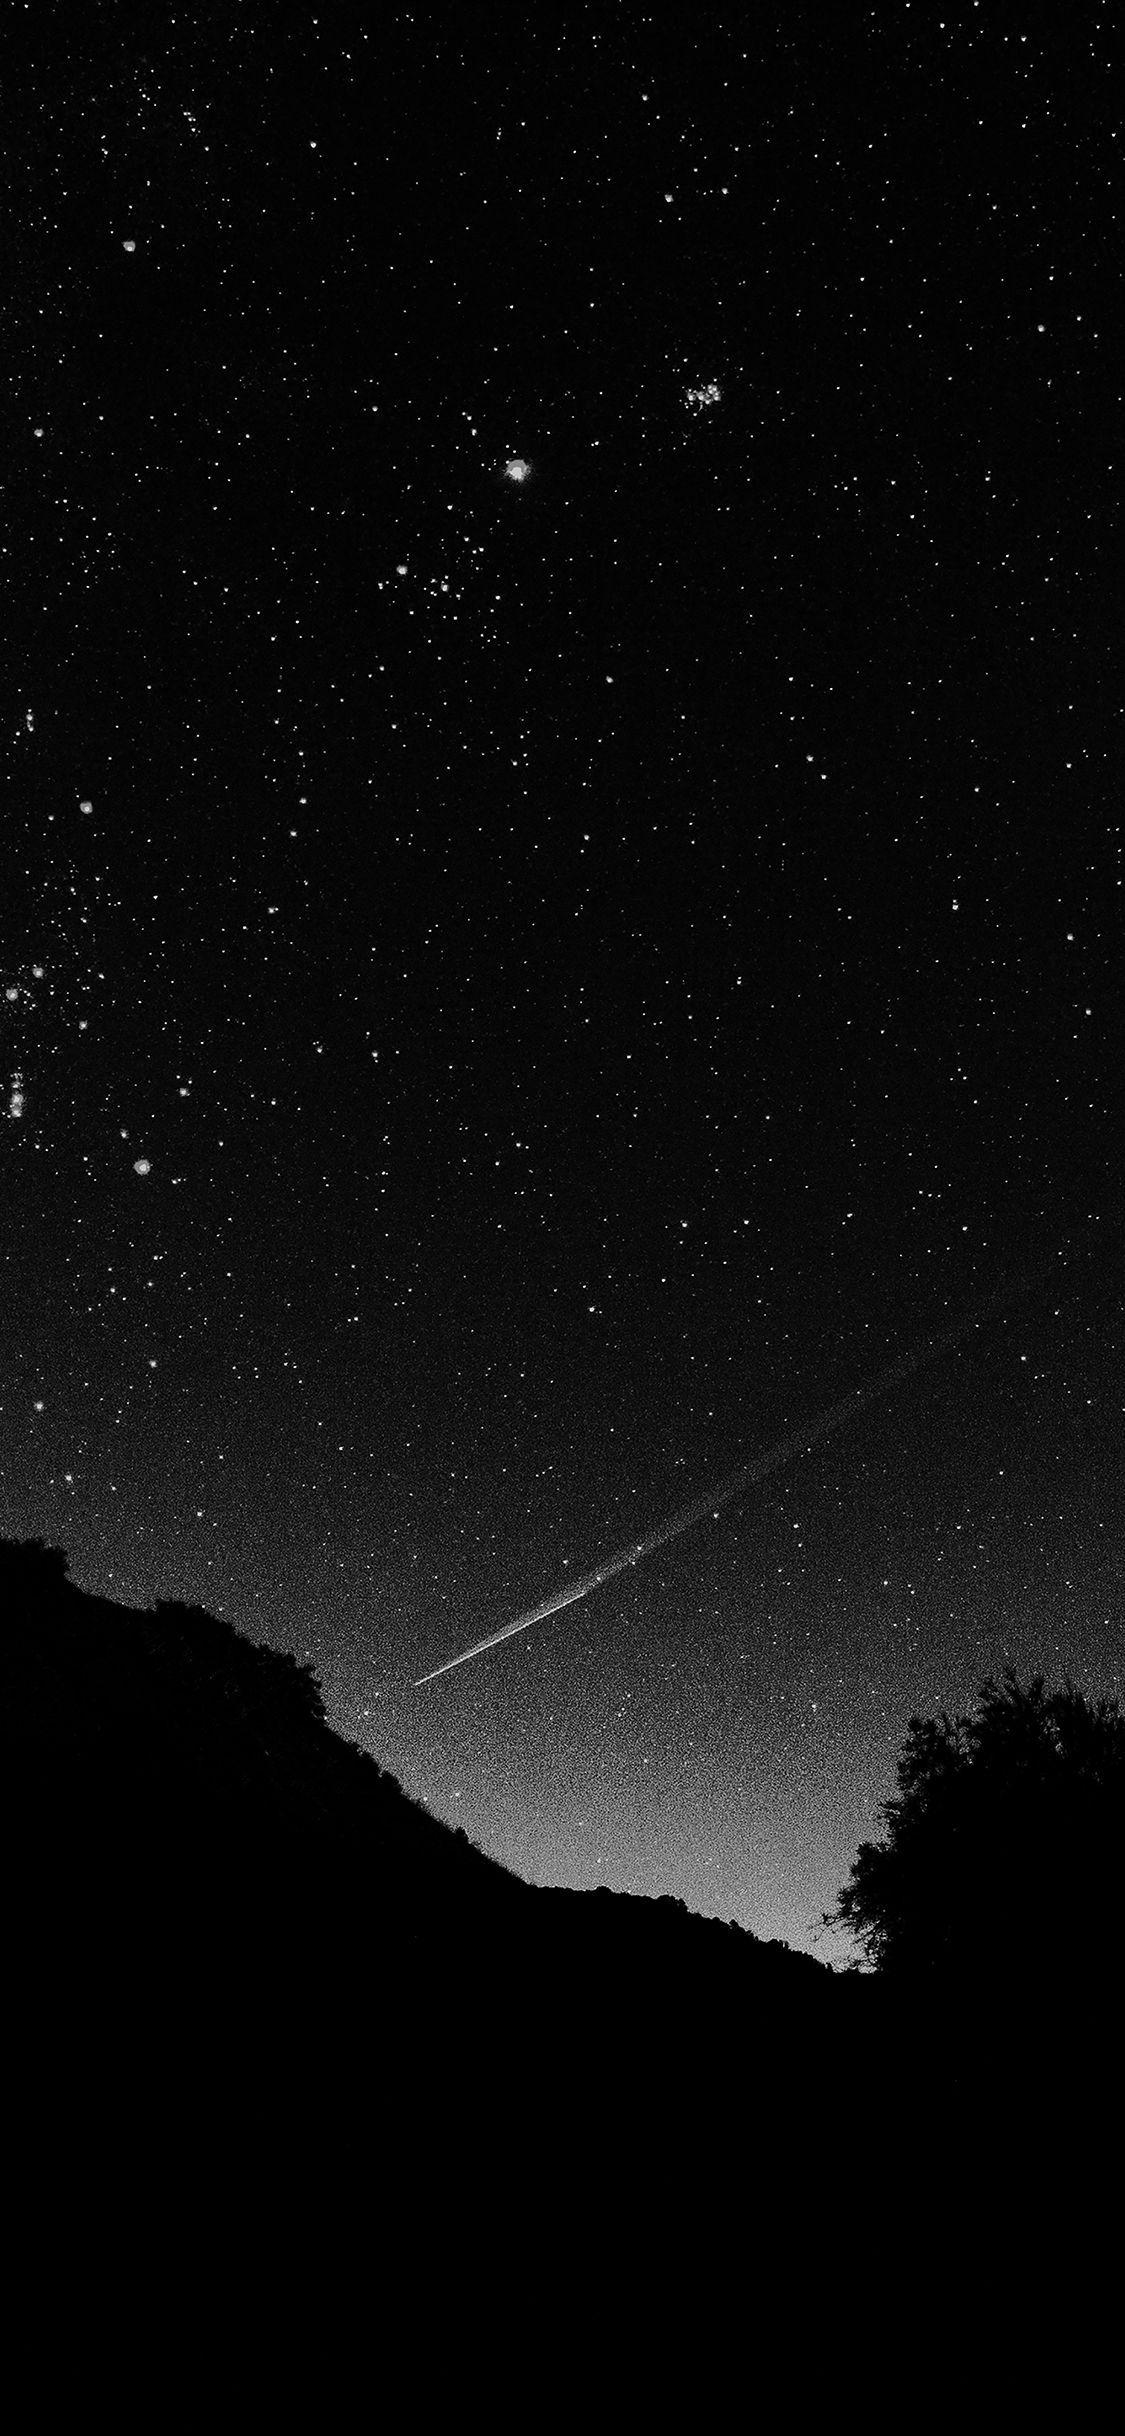 Pin By Erika On Astronomy Night Sky Wallpaper Dark Wallpaper Iphone Wallpaper Stars